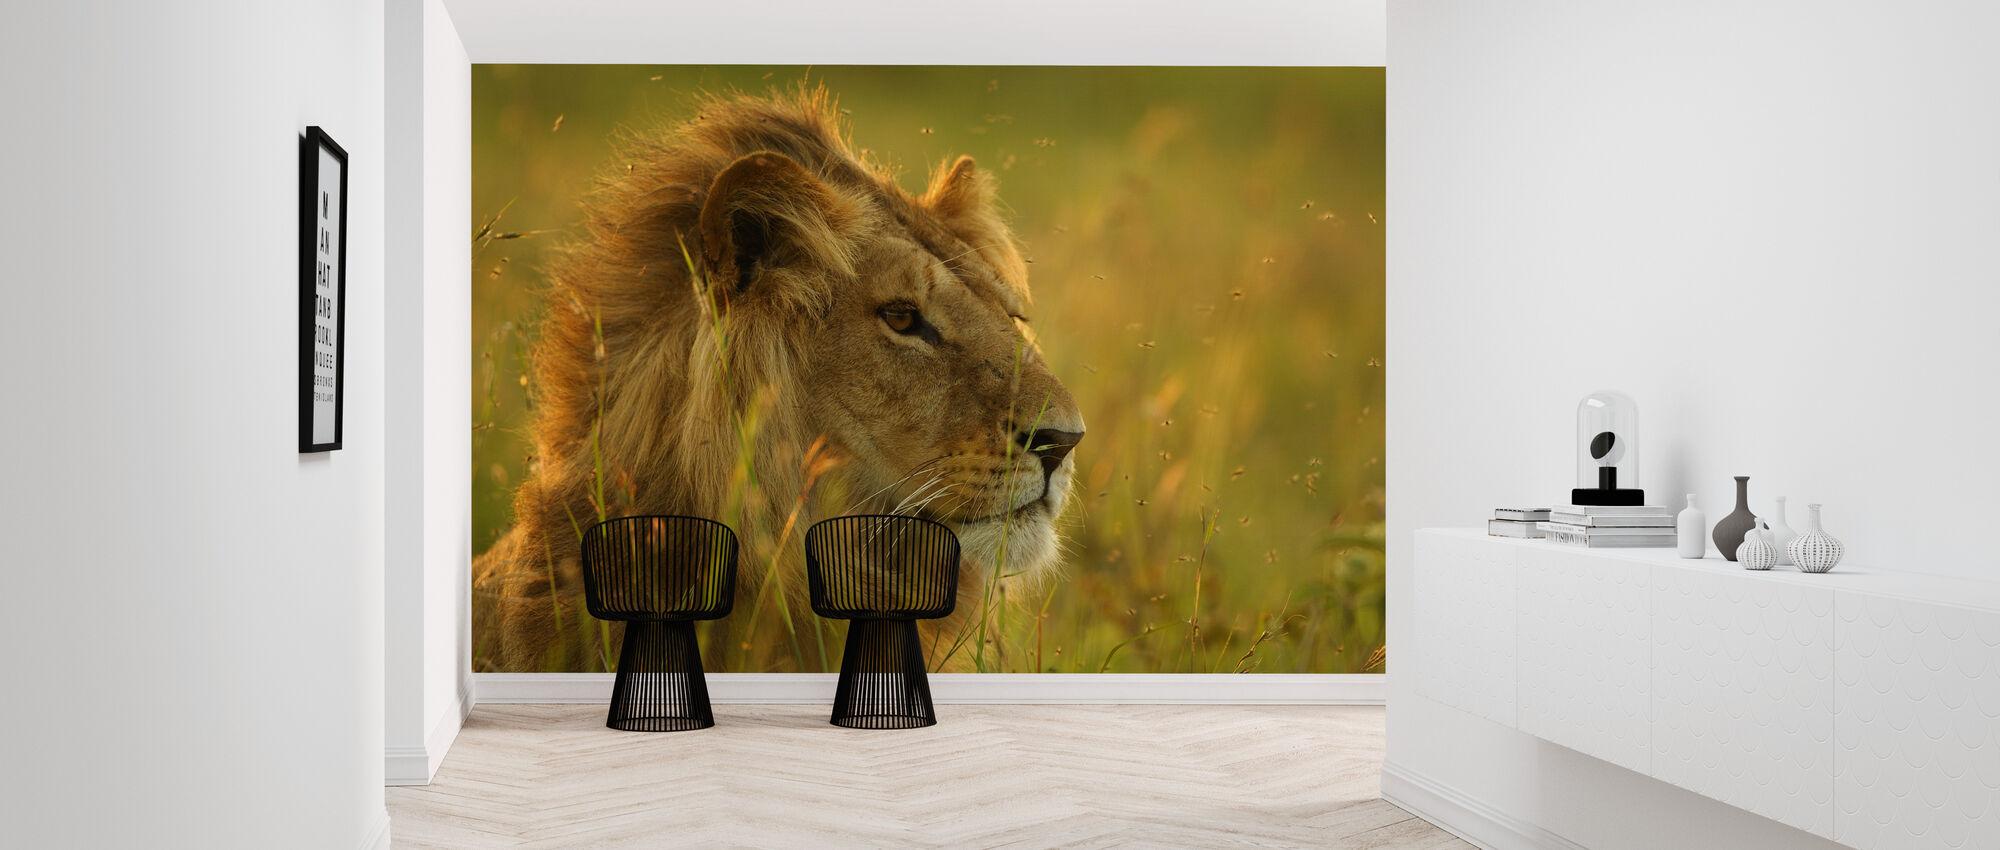 Resting Lion - Wallpaper - Hallway